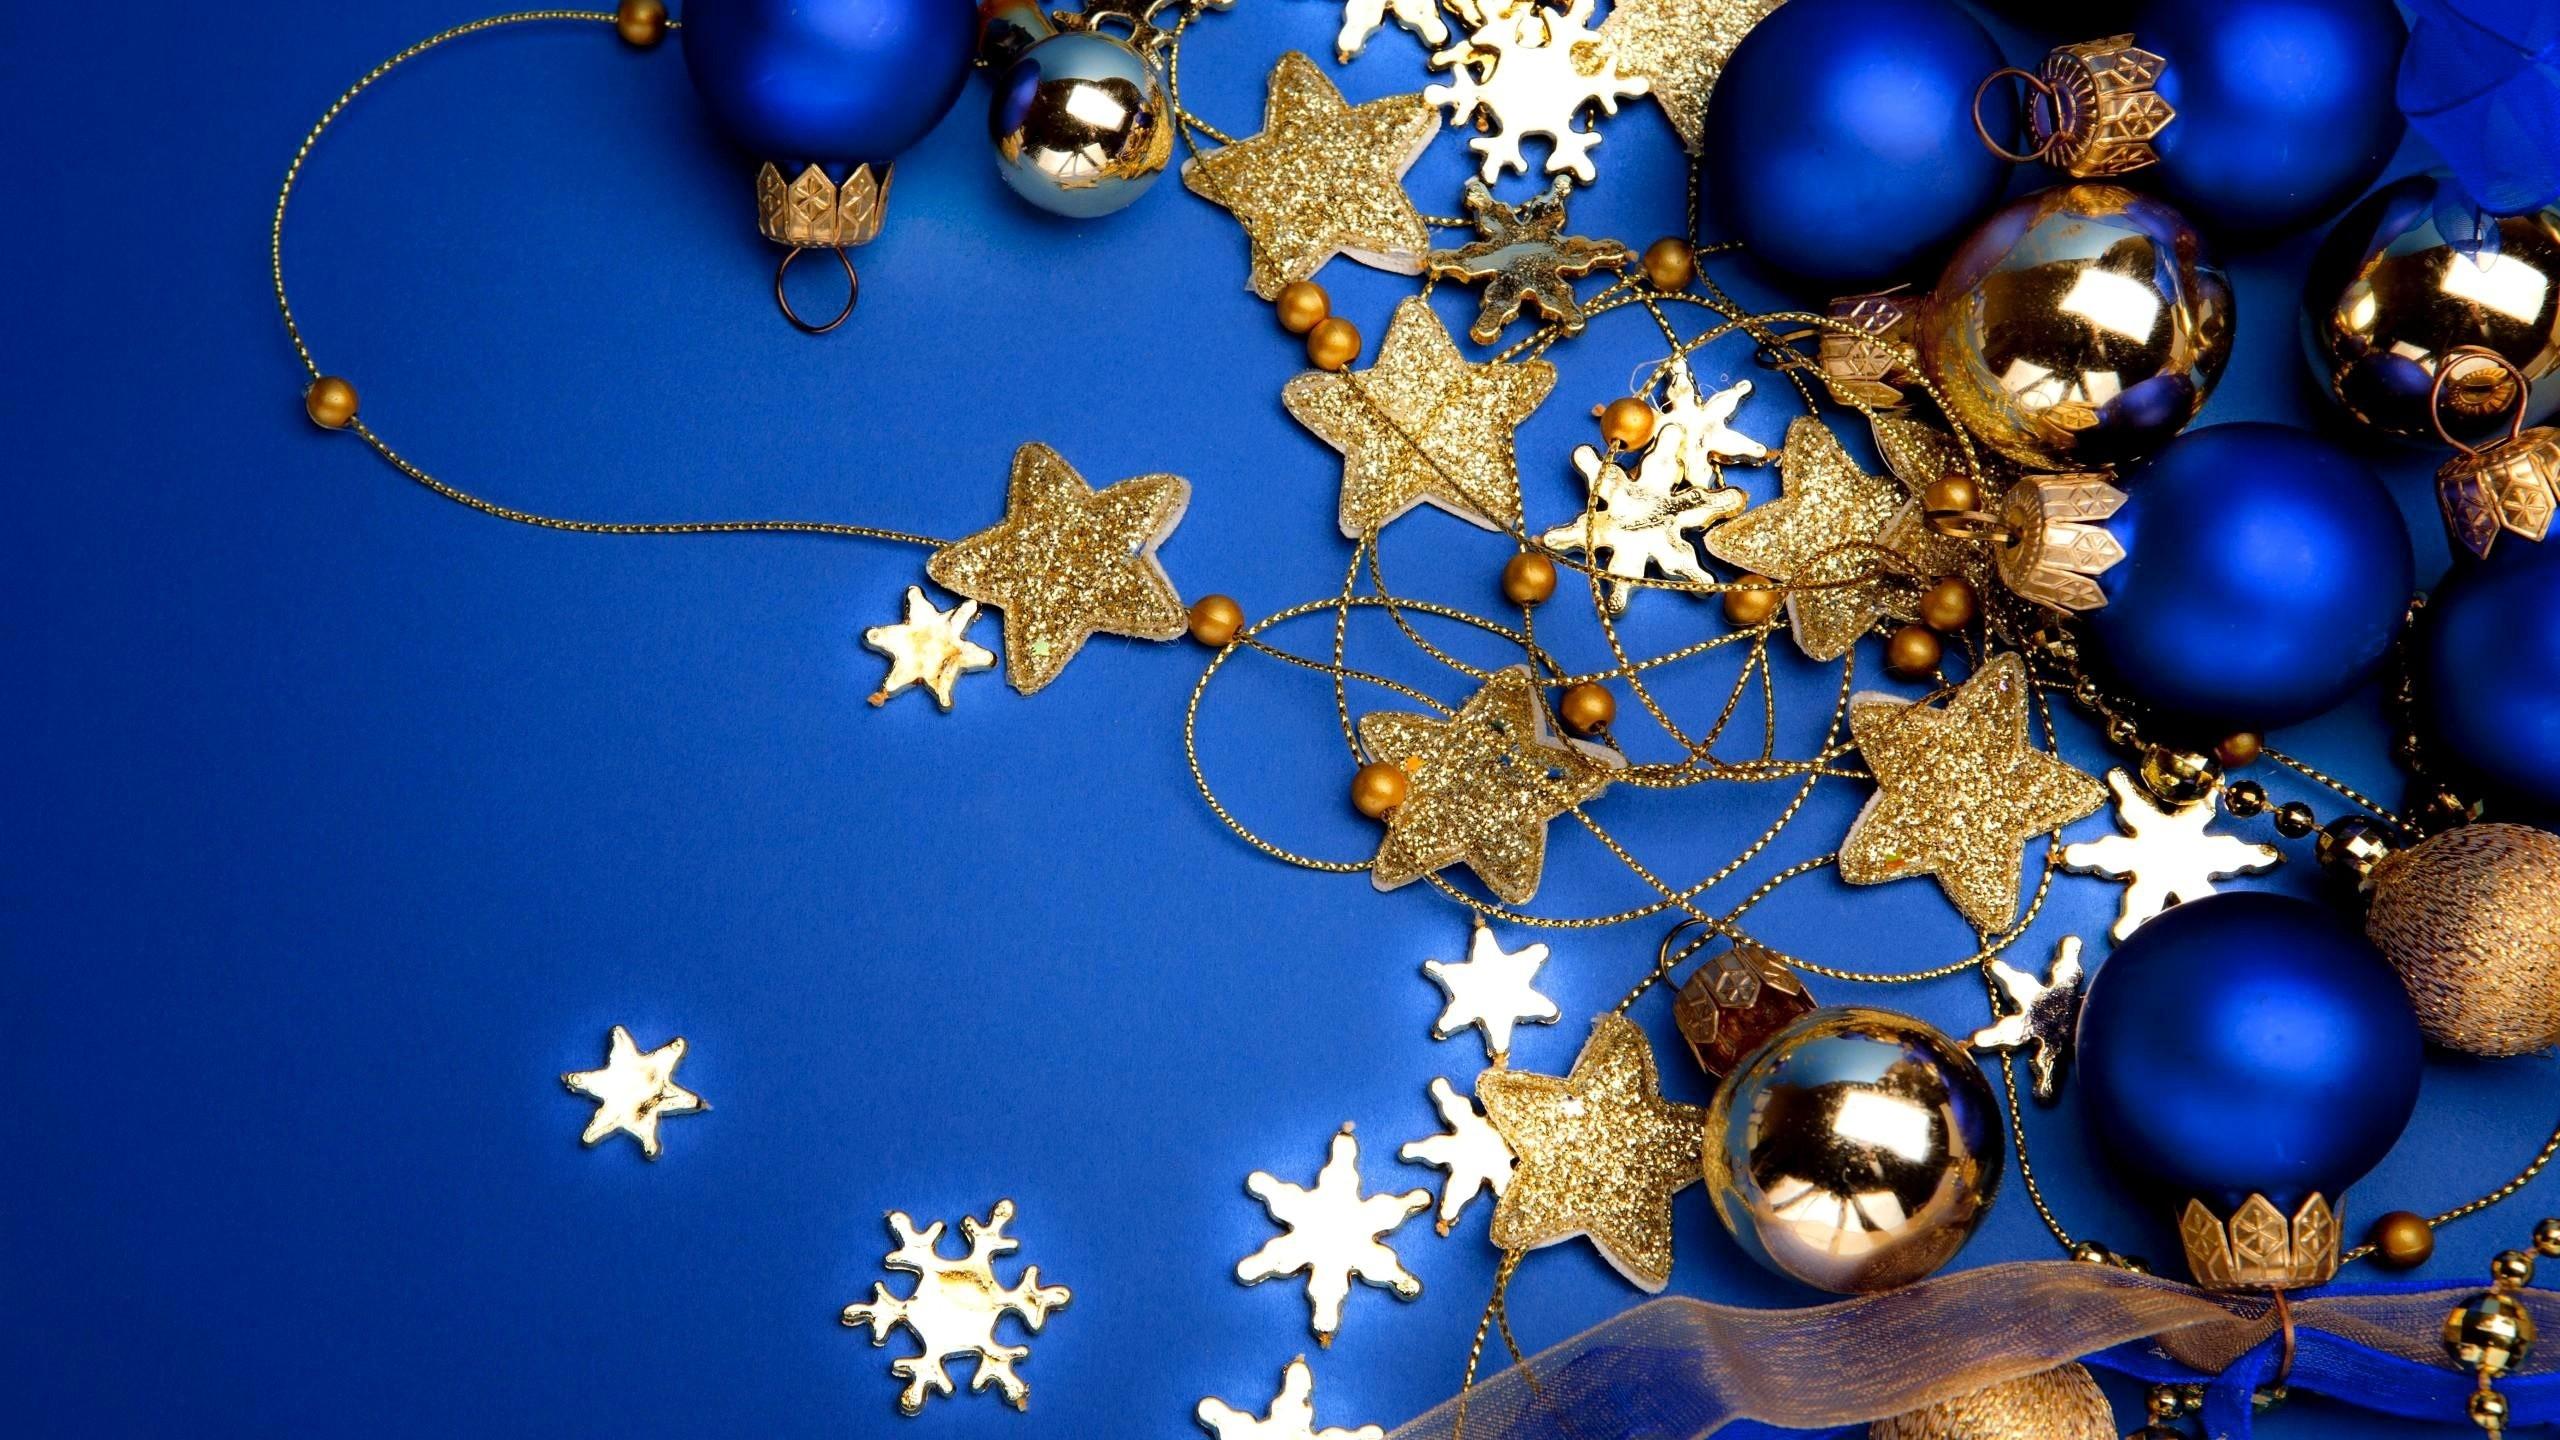 Christmas Wallpaper Free.Blue Christmas Wallpaper 70 Images